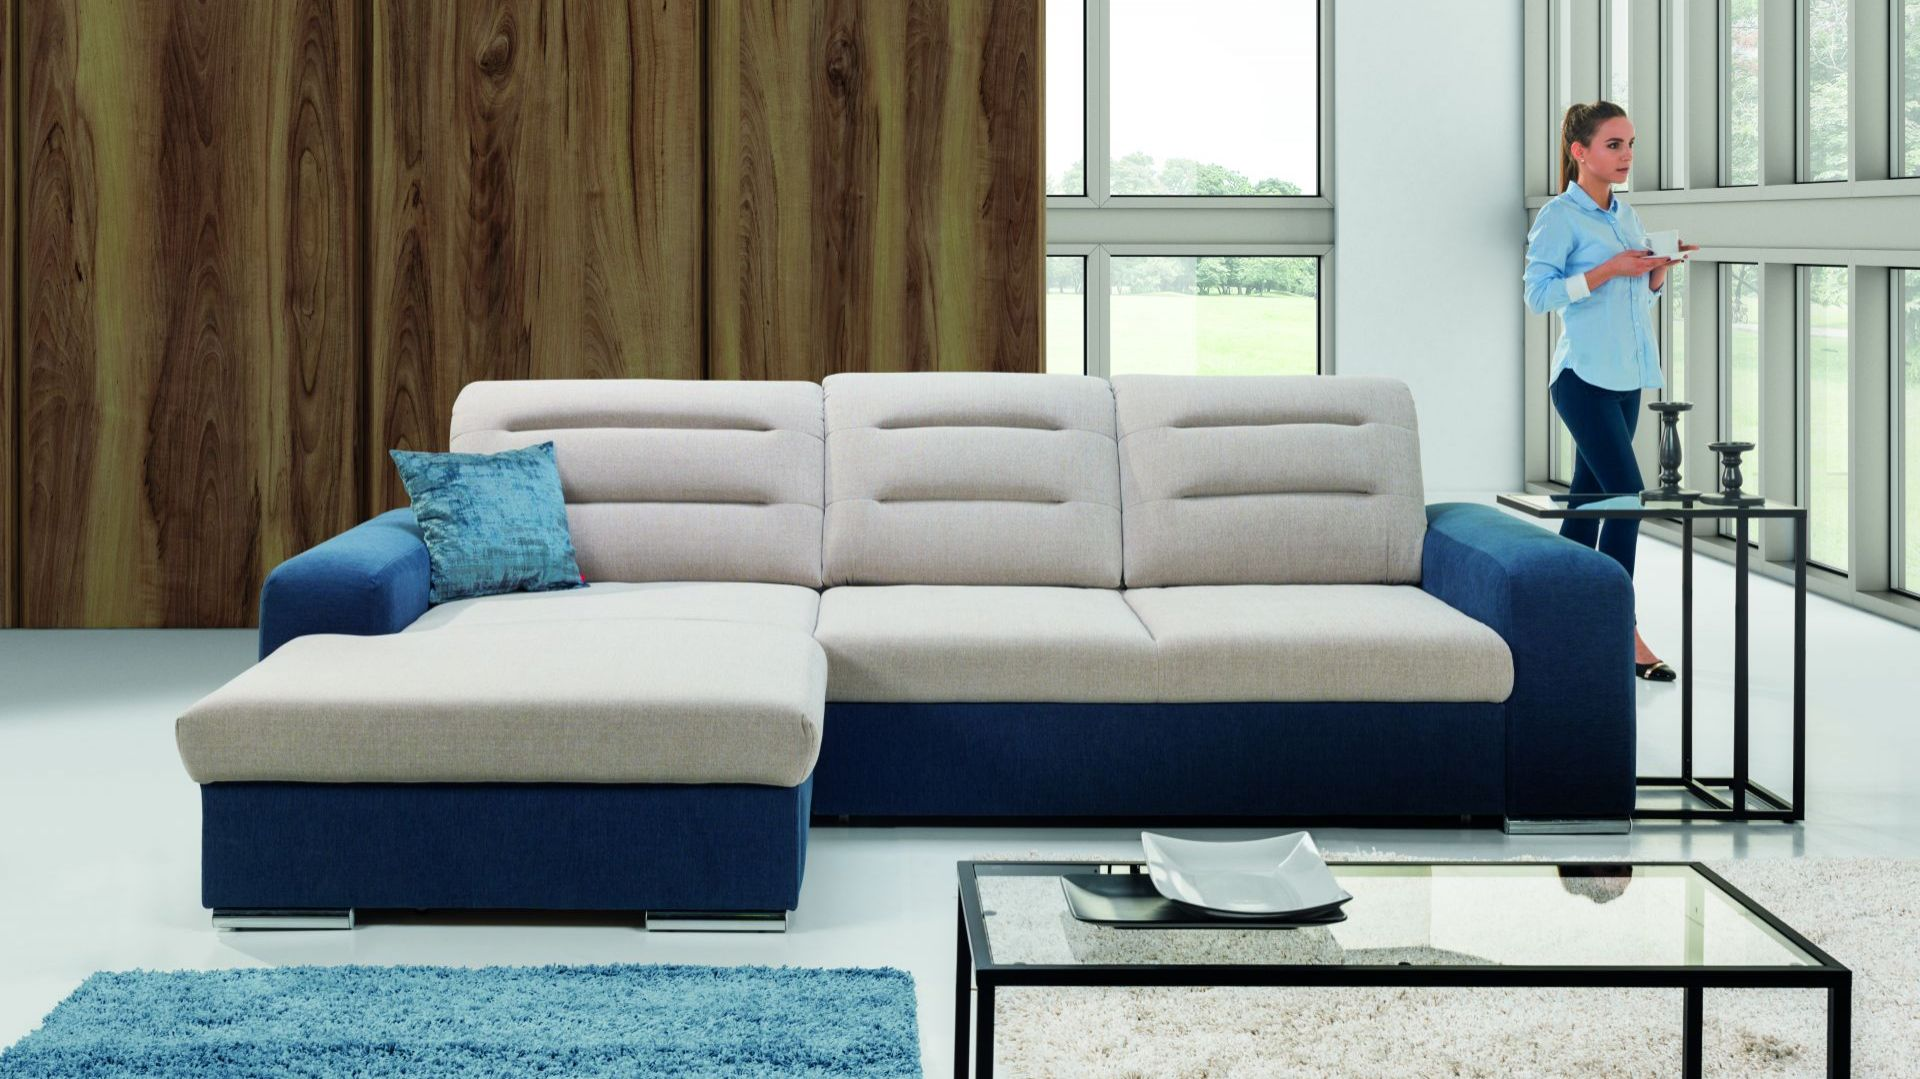 Sofa Play. Fot. Stagra